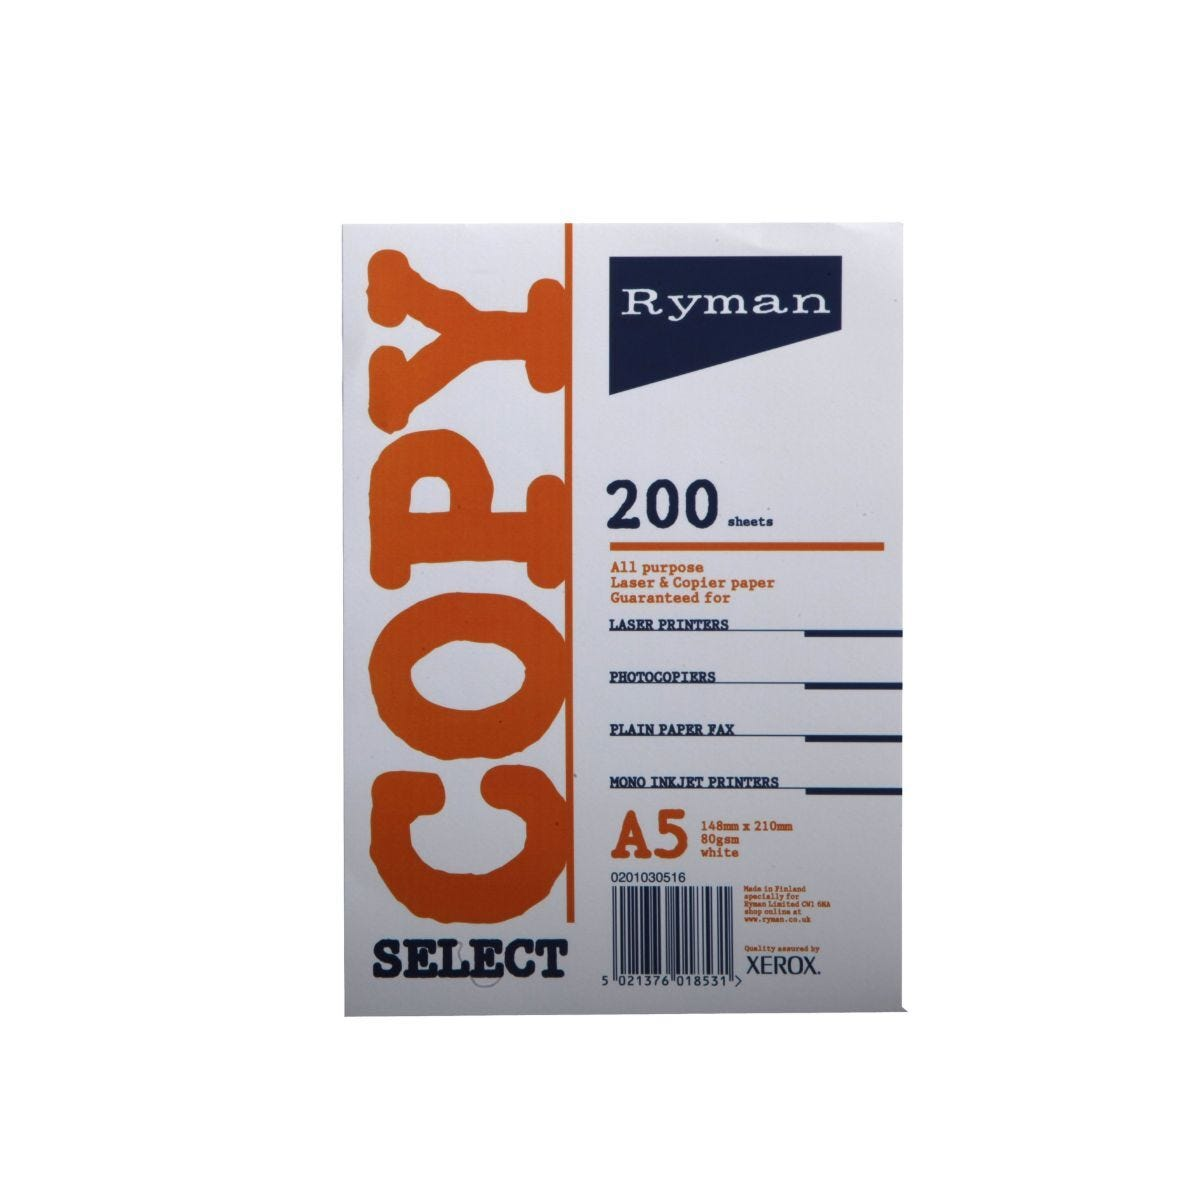 Ryman Select Copy Paper A5 80gsm 200 Sheets